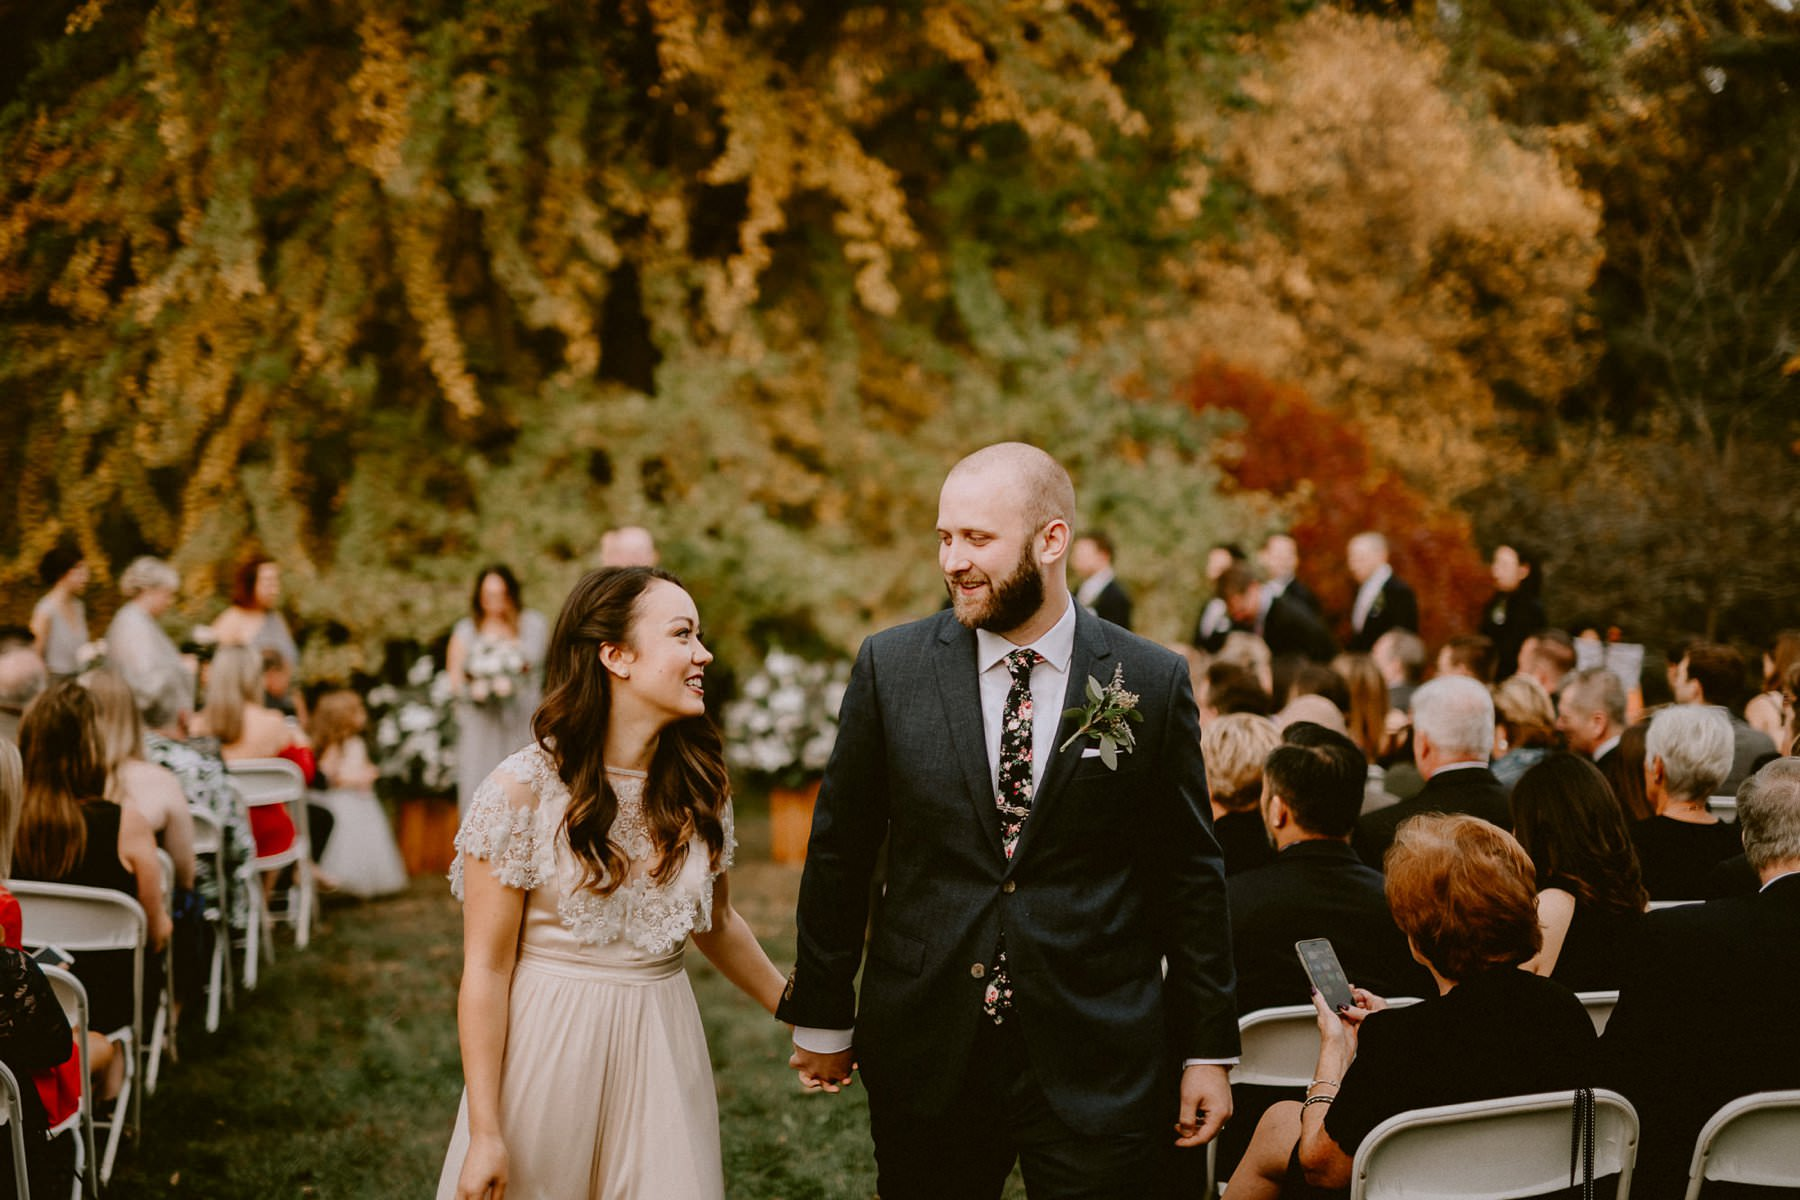 Tyler_arboretum_wedding-064.jpg